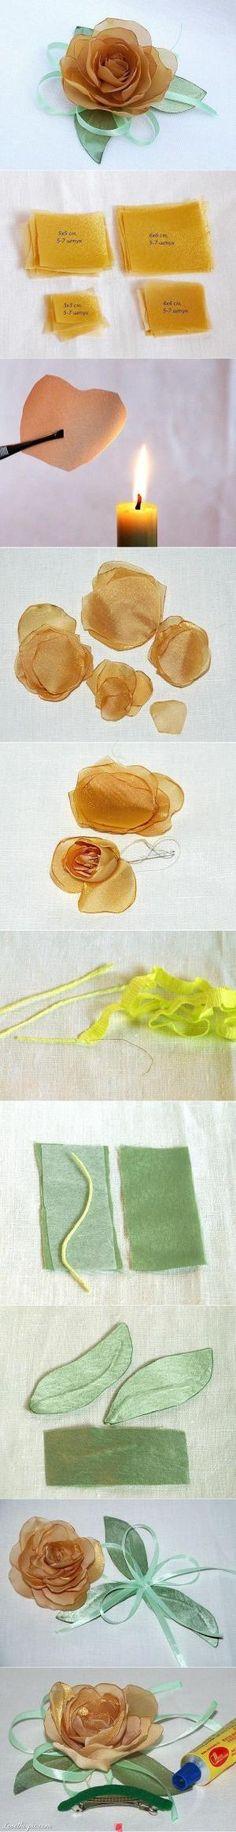 DIY Hair Flower Bow flowers diy crafts home made easy crafts craft idea crafts ideas diy ideas diy crafts diy idea do it yourself diy projects diy craft handmade by tammydean123